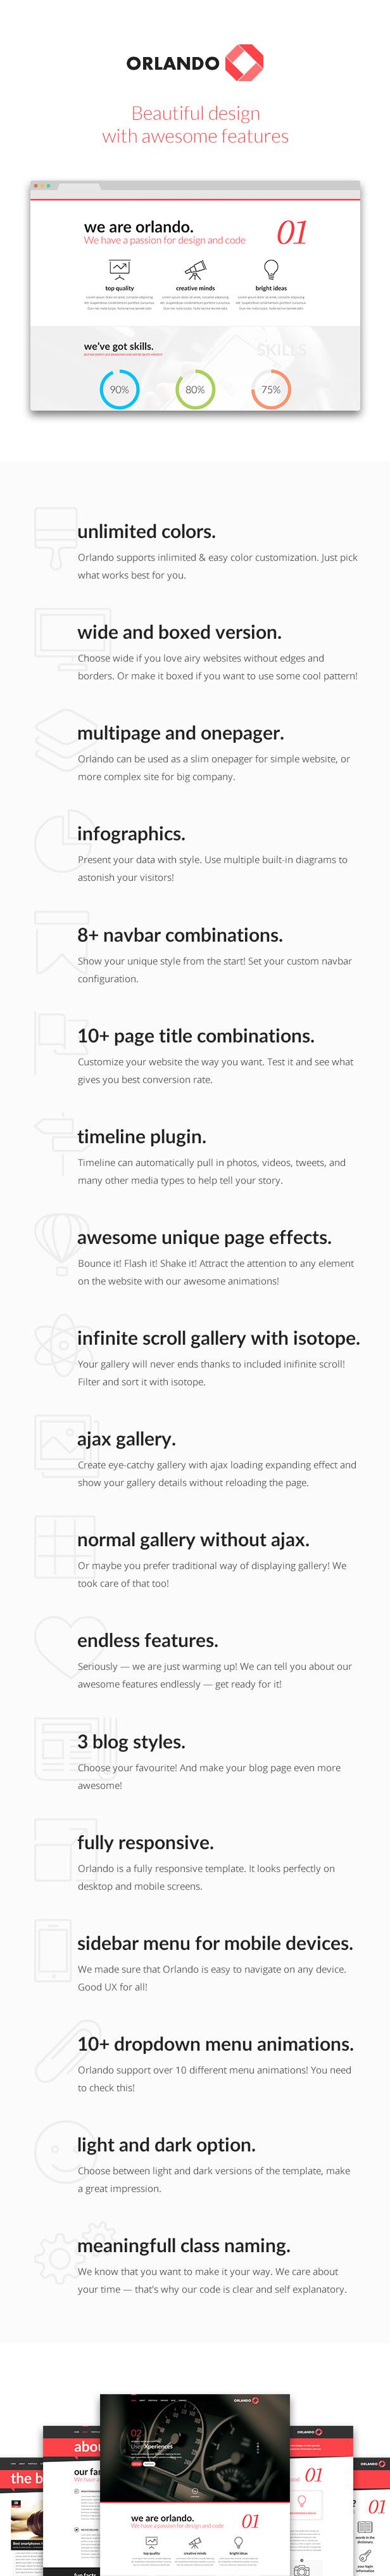 Orlando - Creative Infographics HTML Template - 10